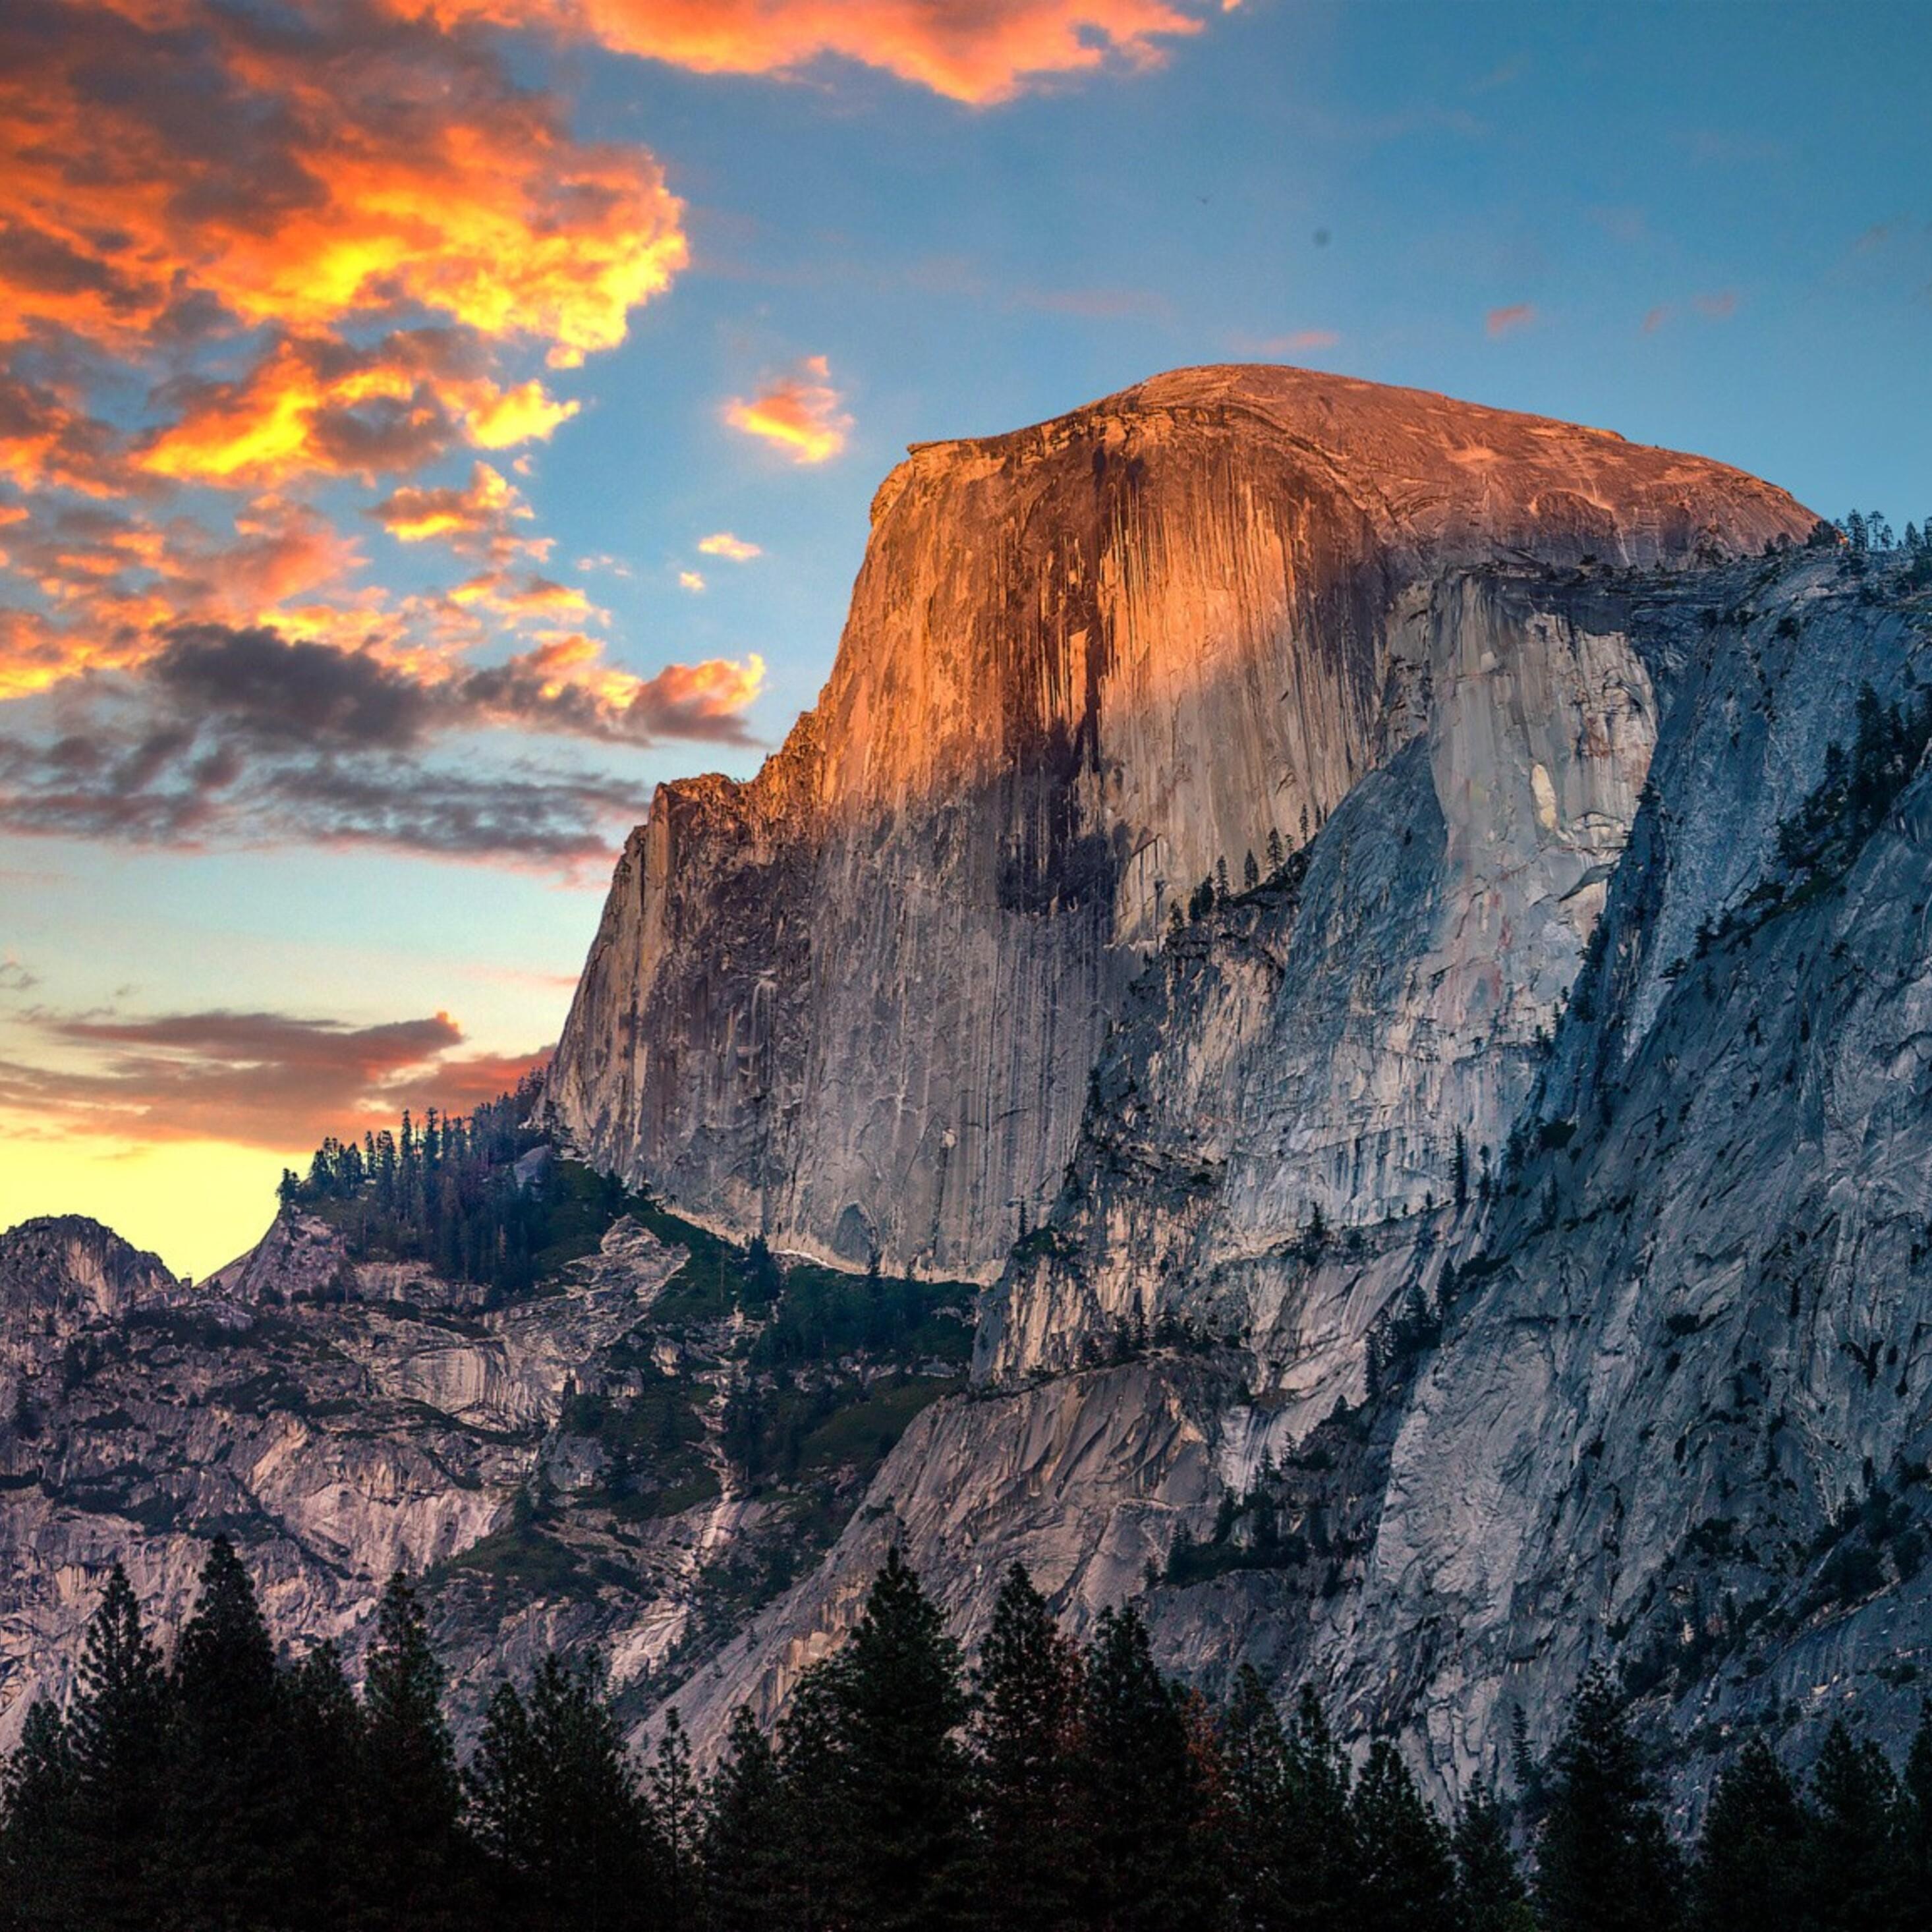 Popular Wallpaper Mountain Ipad Pro - beautiful-mountains-wallpaper-2932x2932  You Should Have_98288.jpg